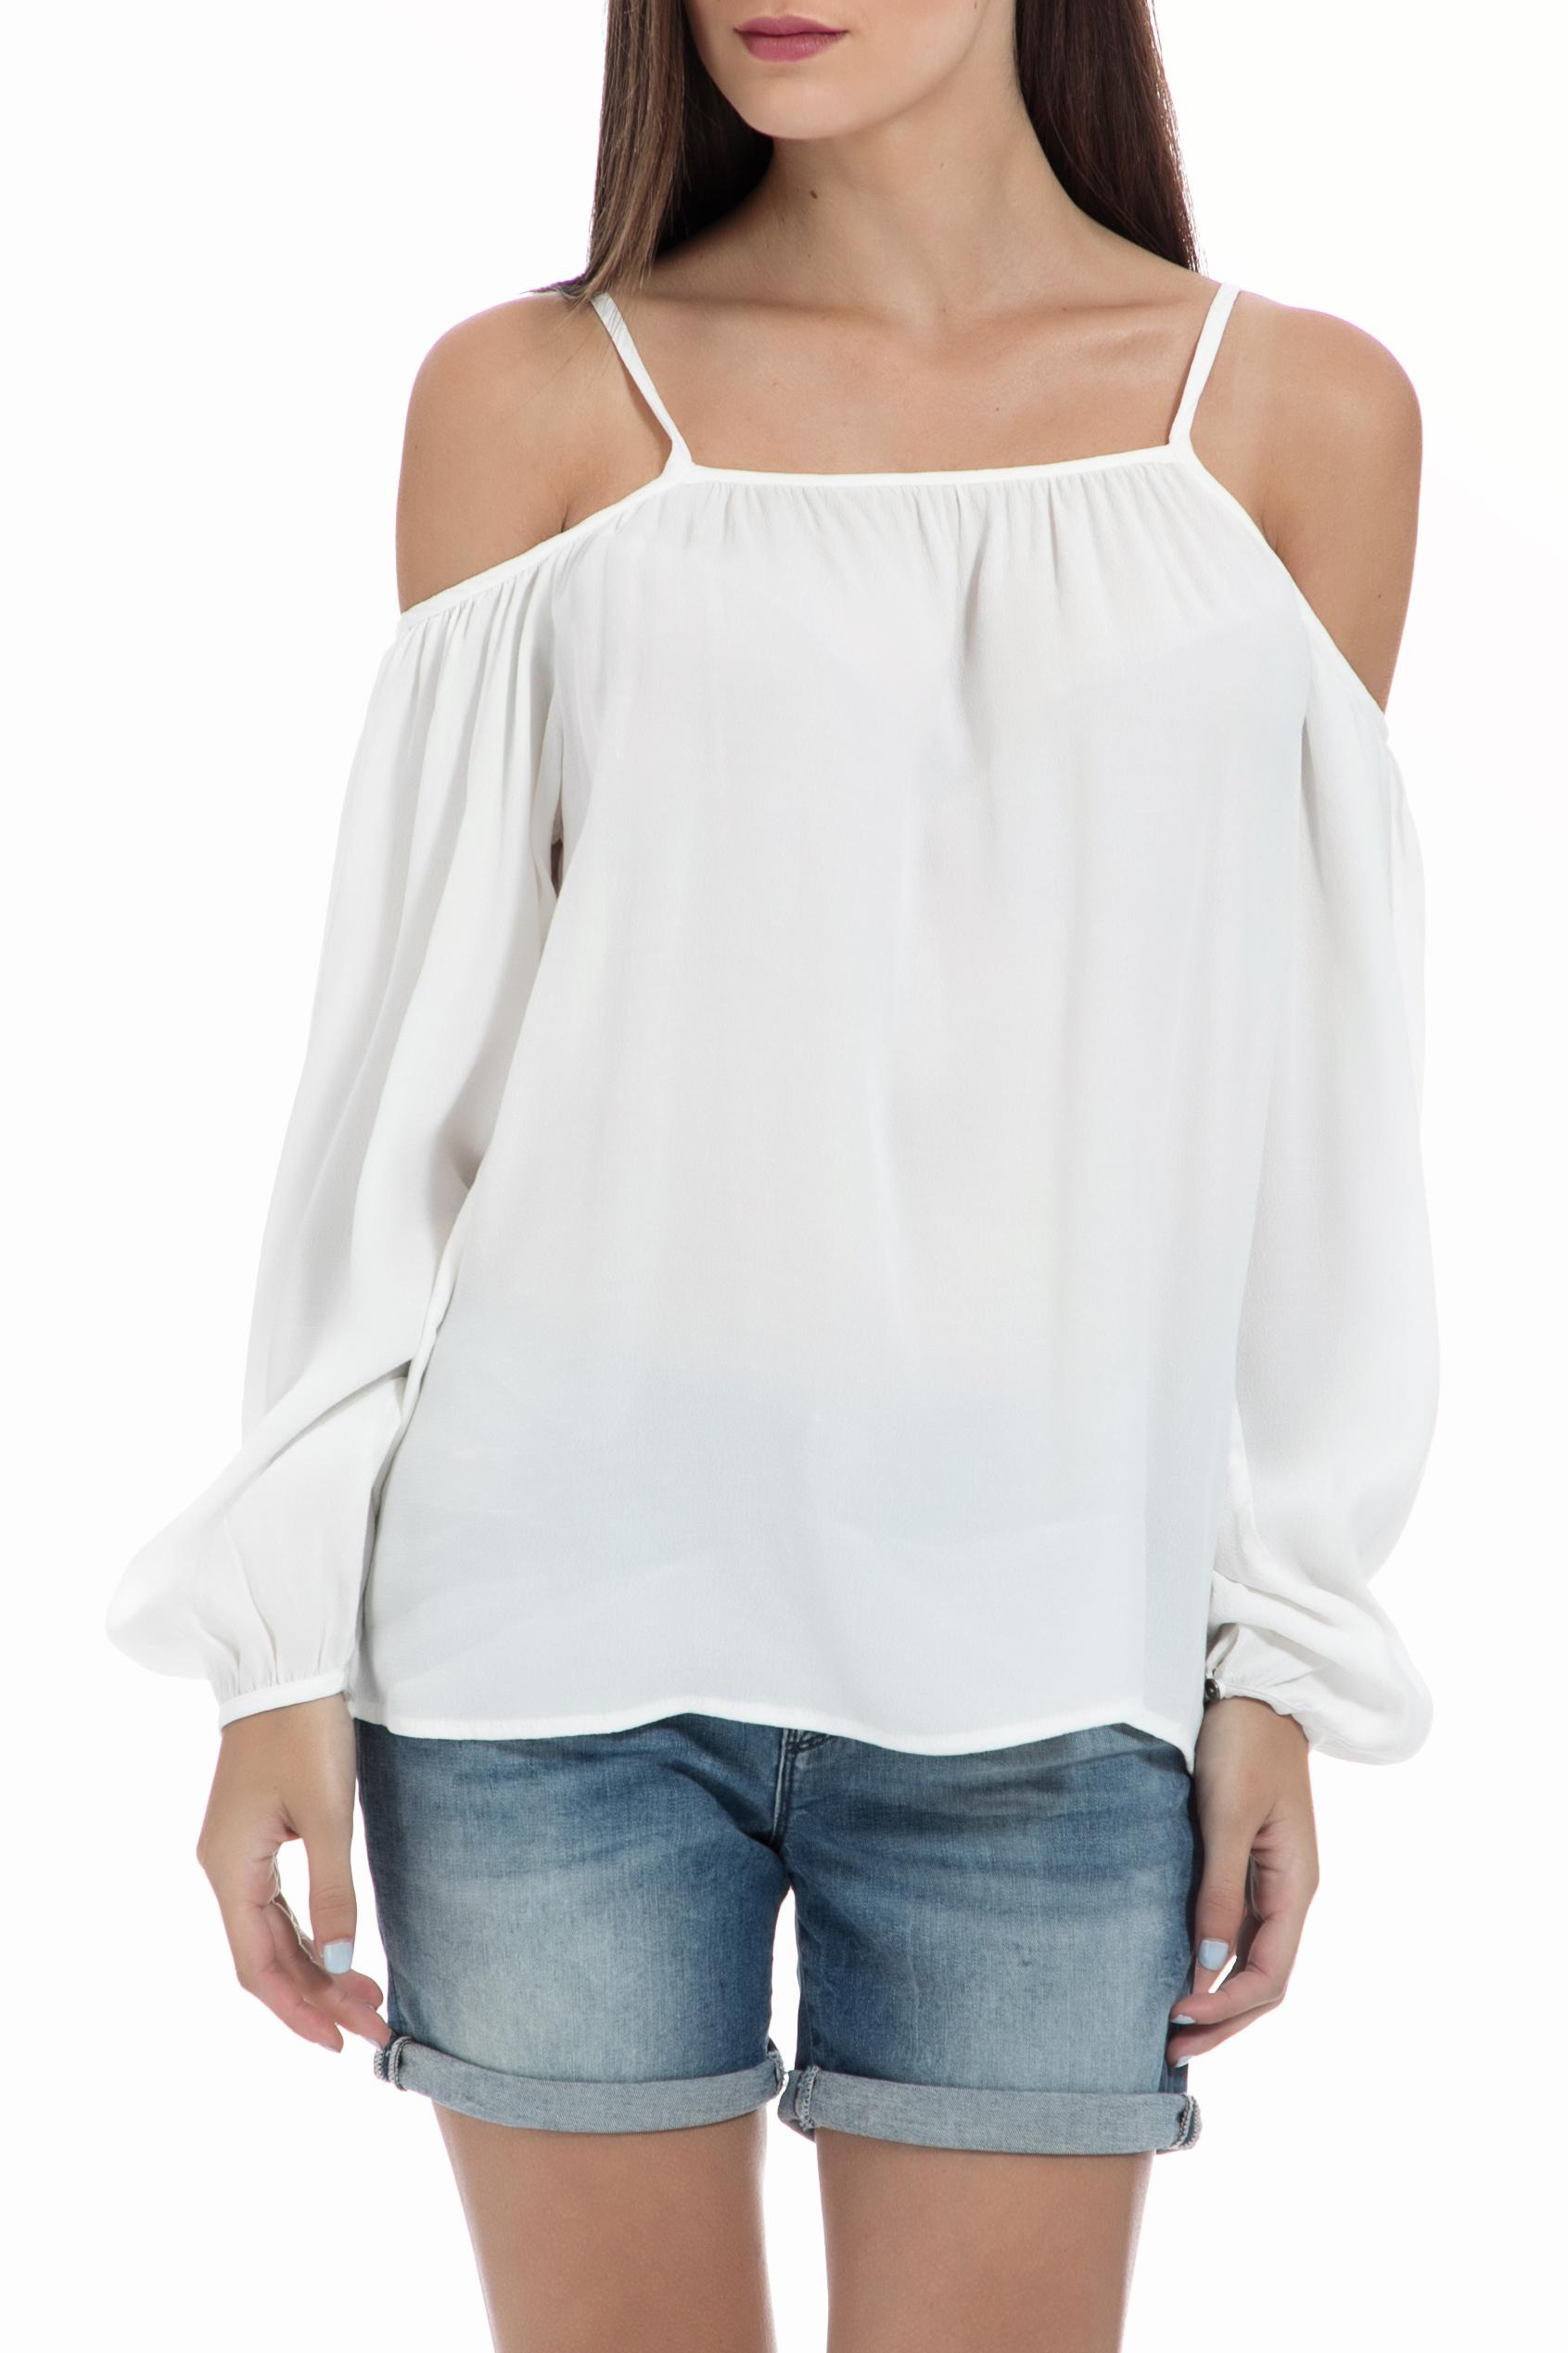 GARCIA JEANS – Γυναικεία μπλούζα Garcia Jeans λευκή